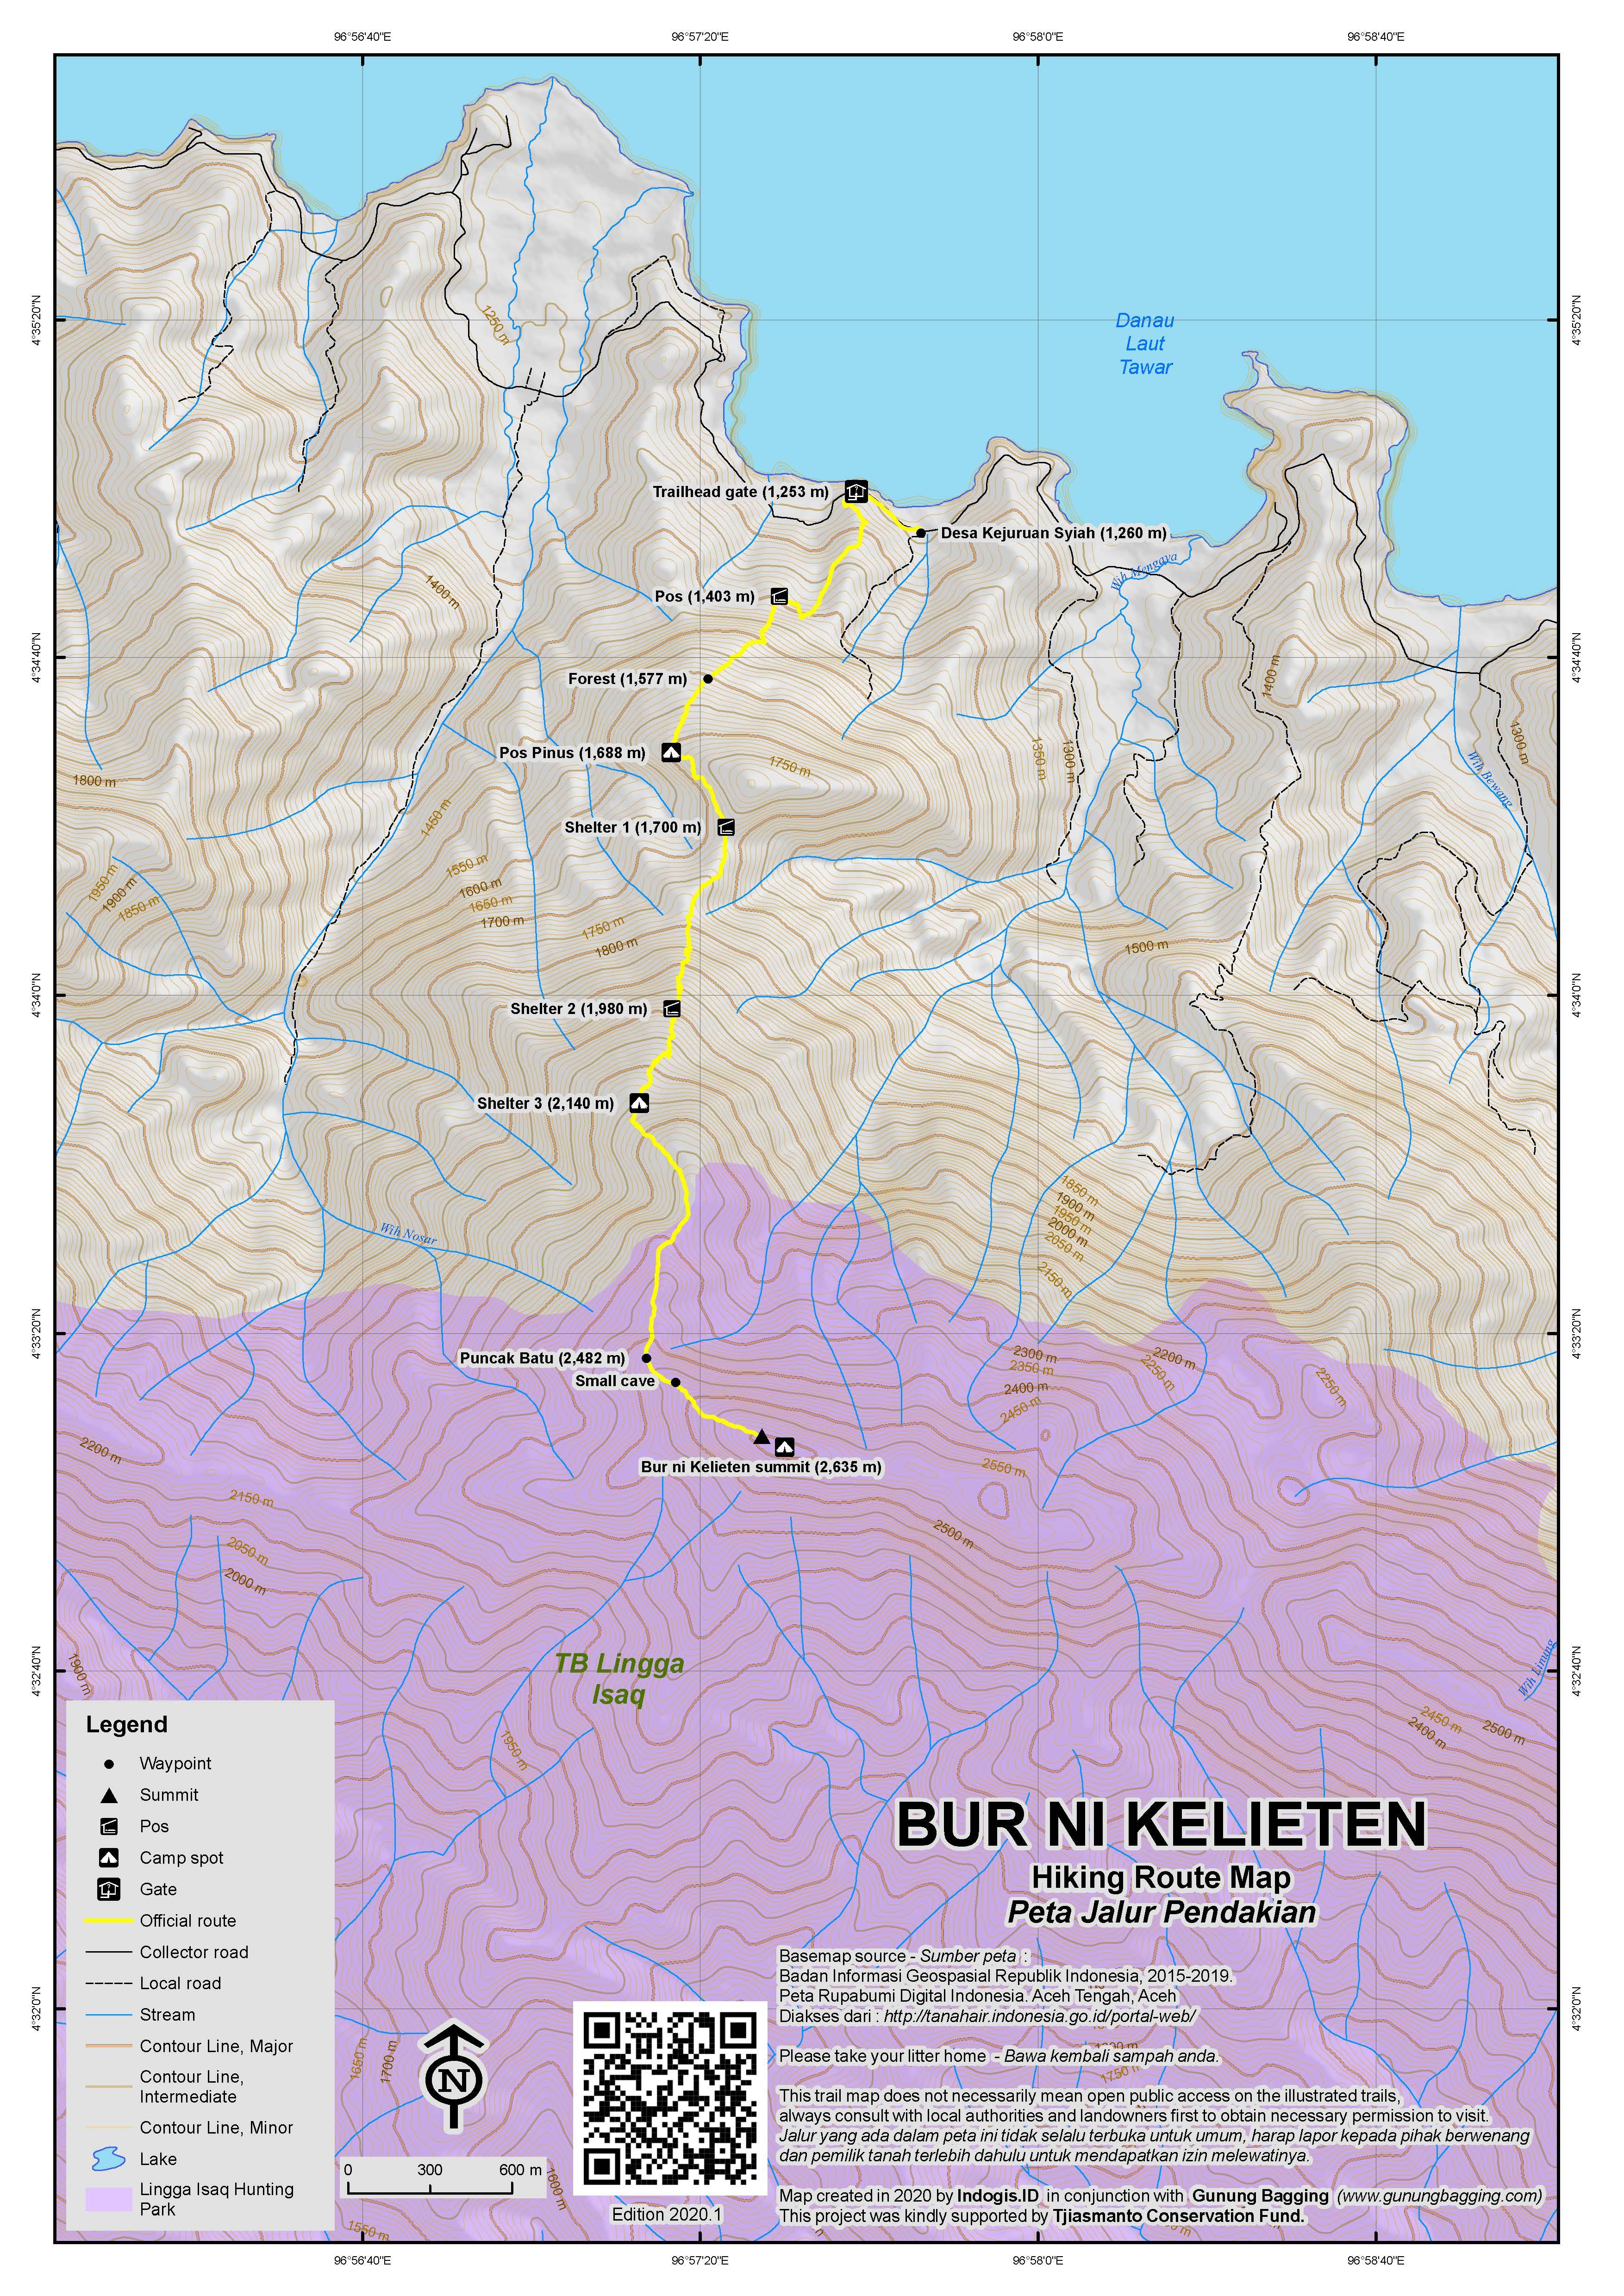 Peta Jalur Pendakian Bur ni Kelieten